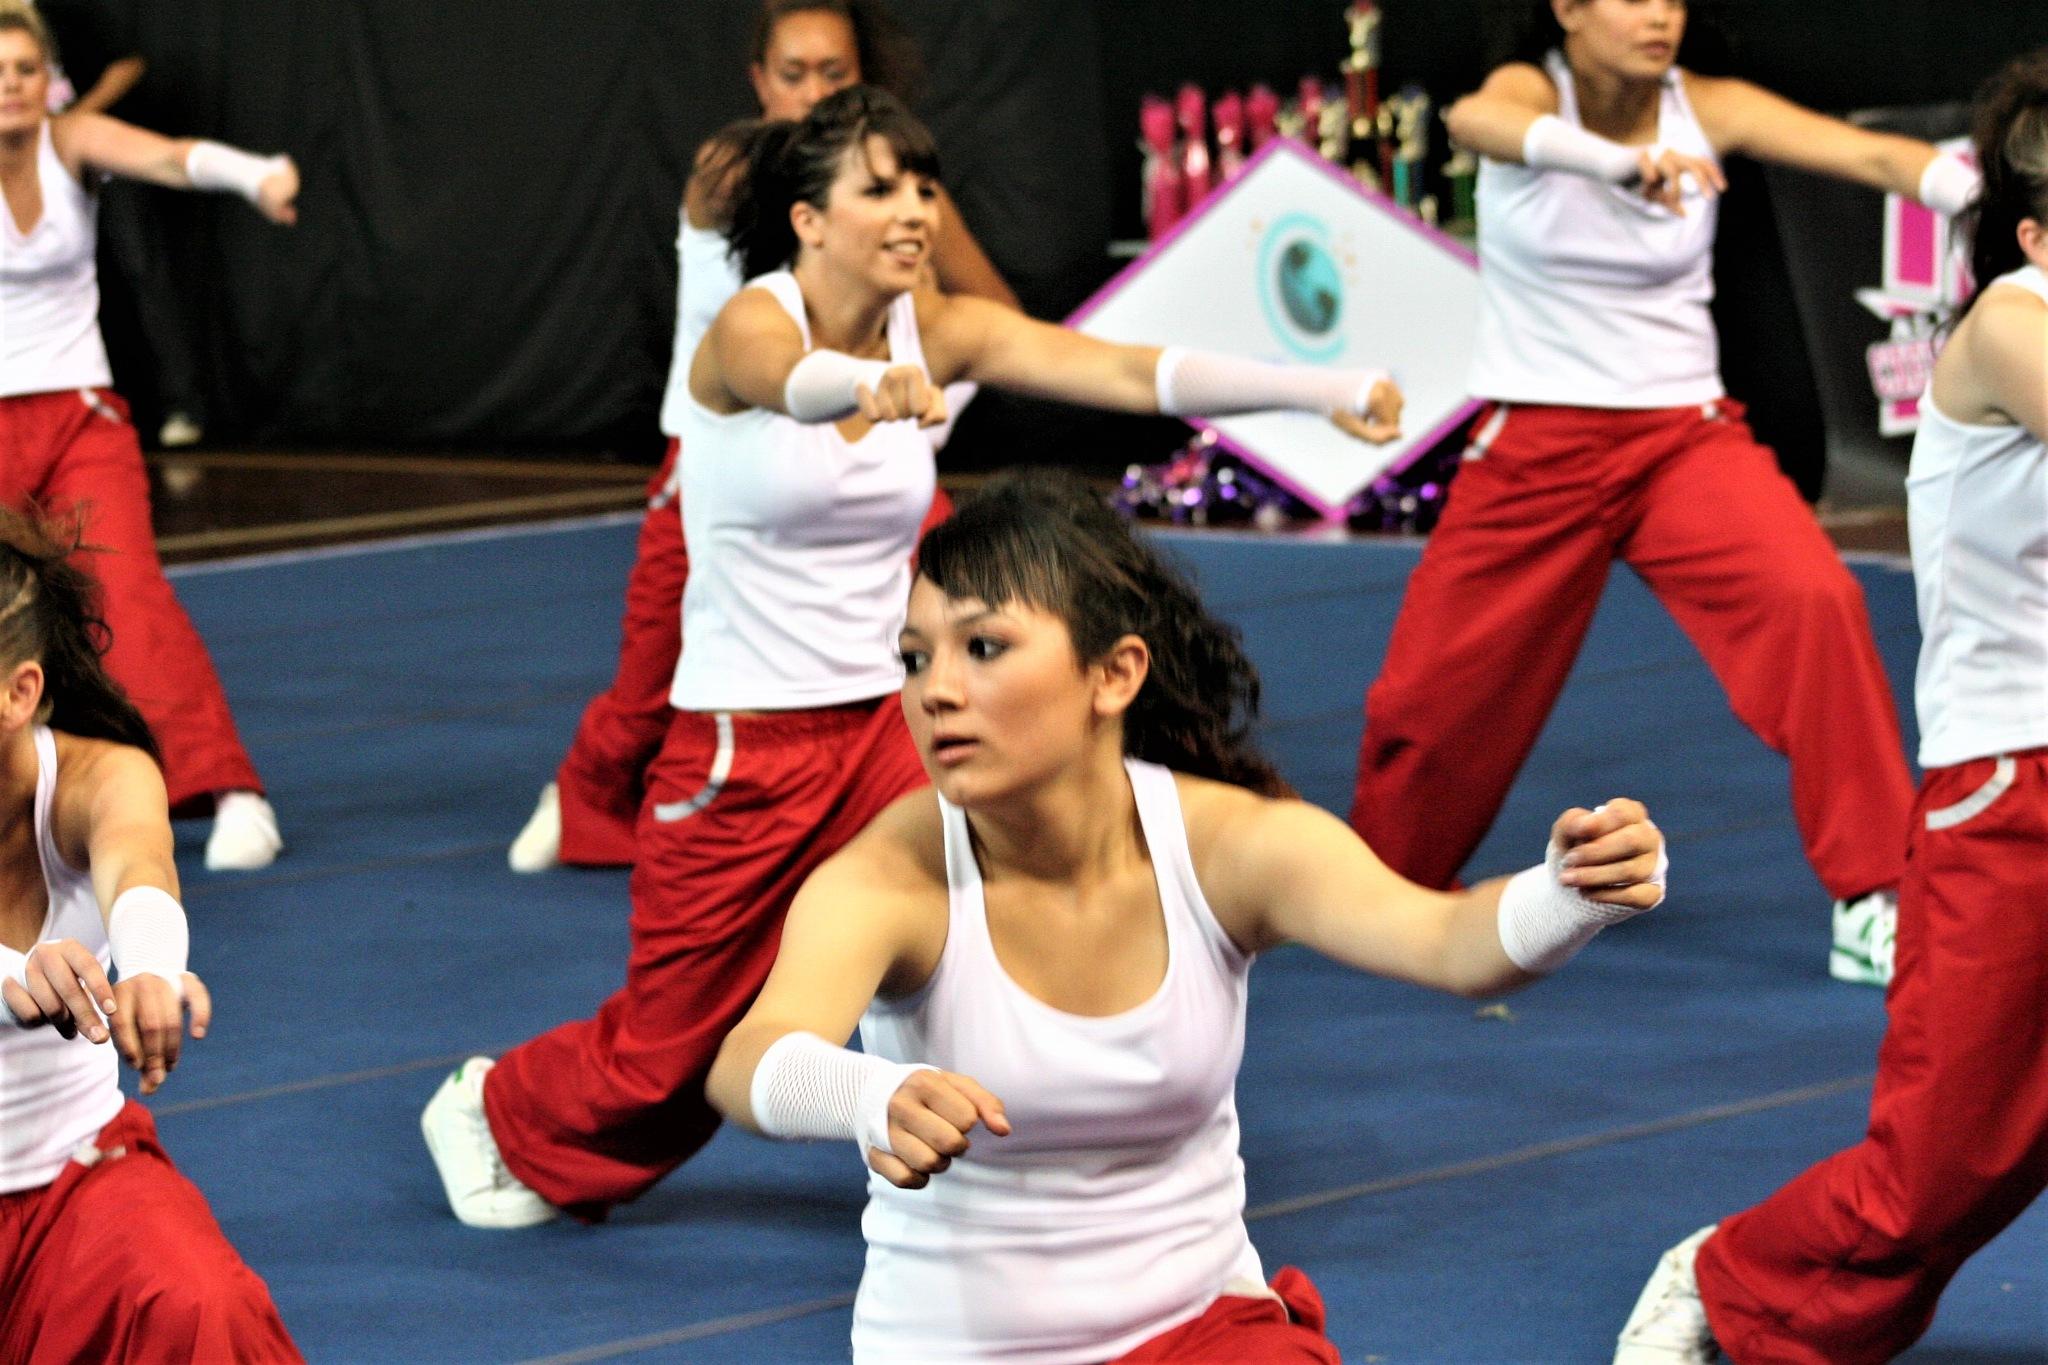 Dance Sport by Luigi Cappel